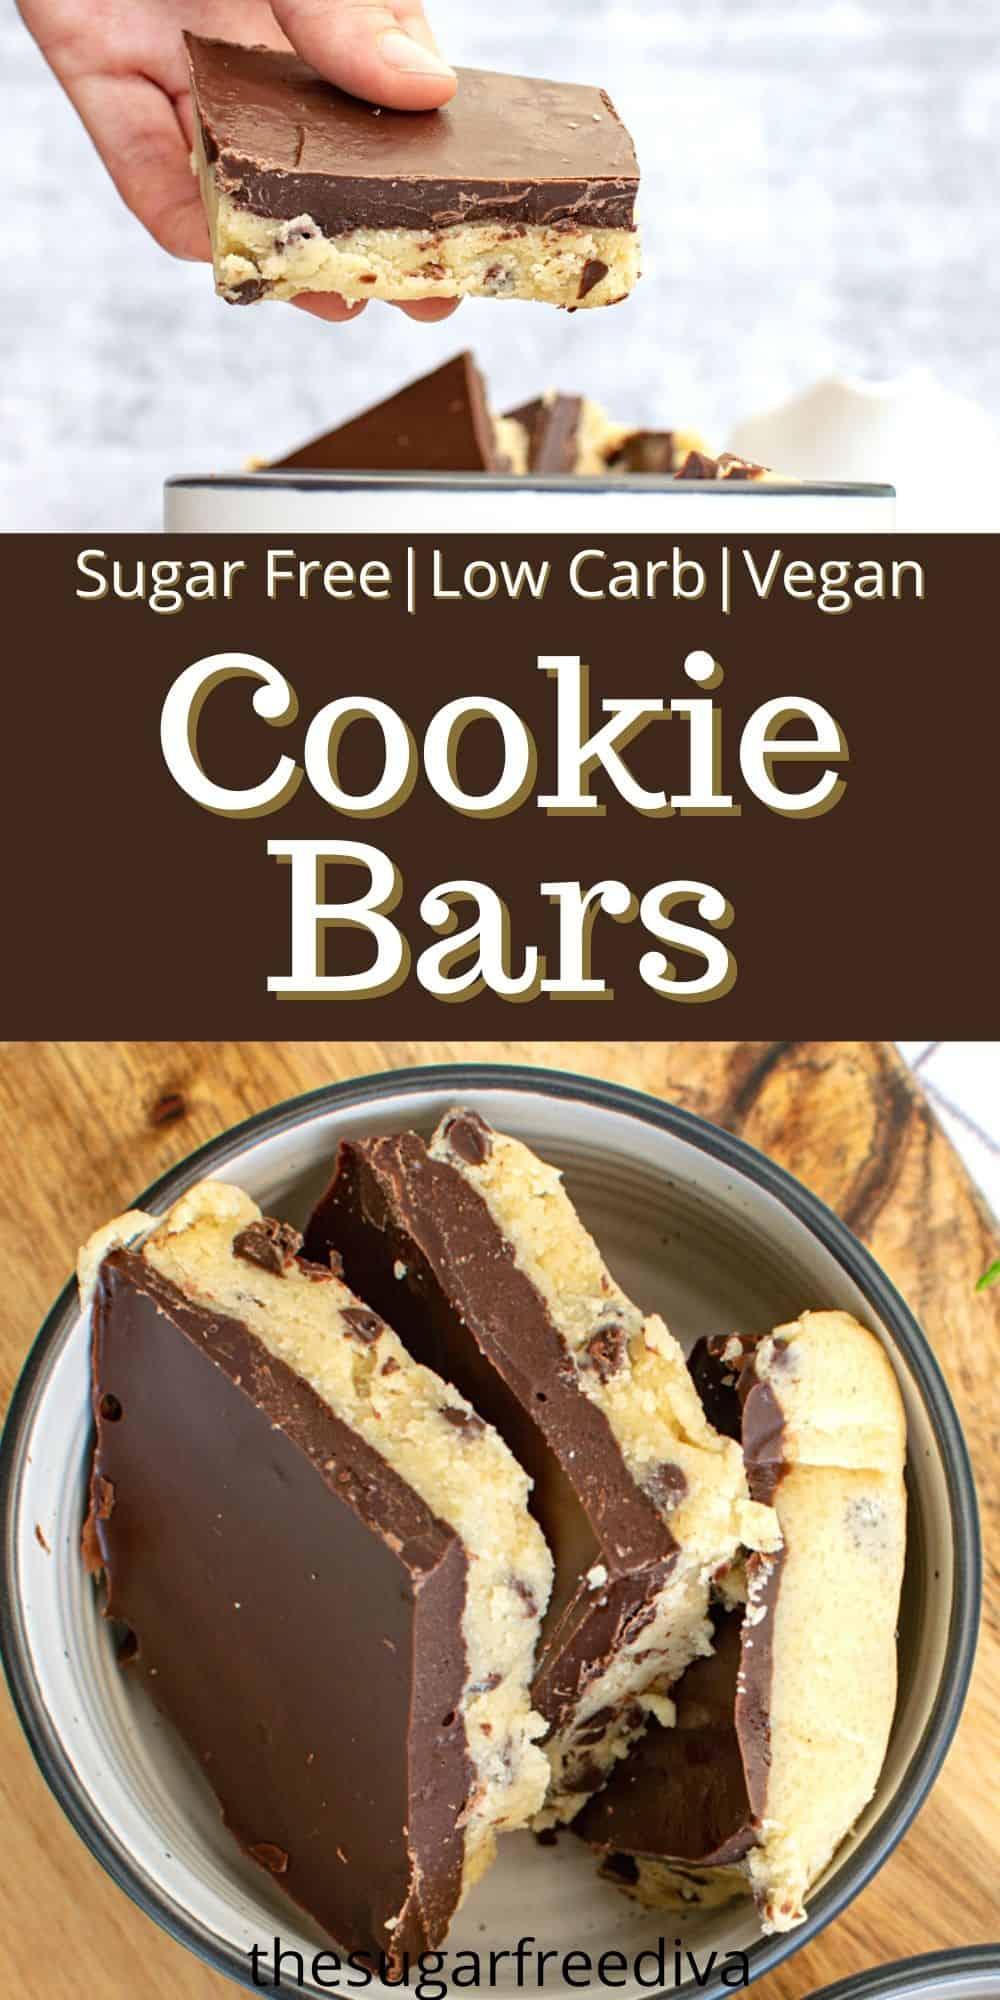 Sugar Free Low Carb Cookie Bars